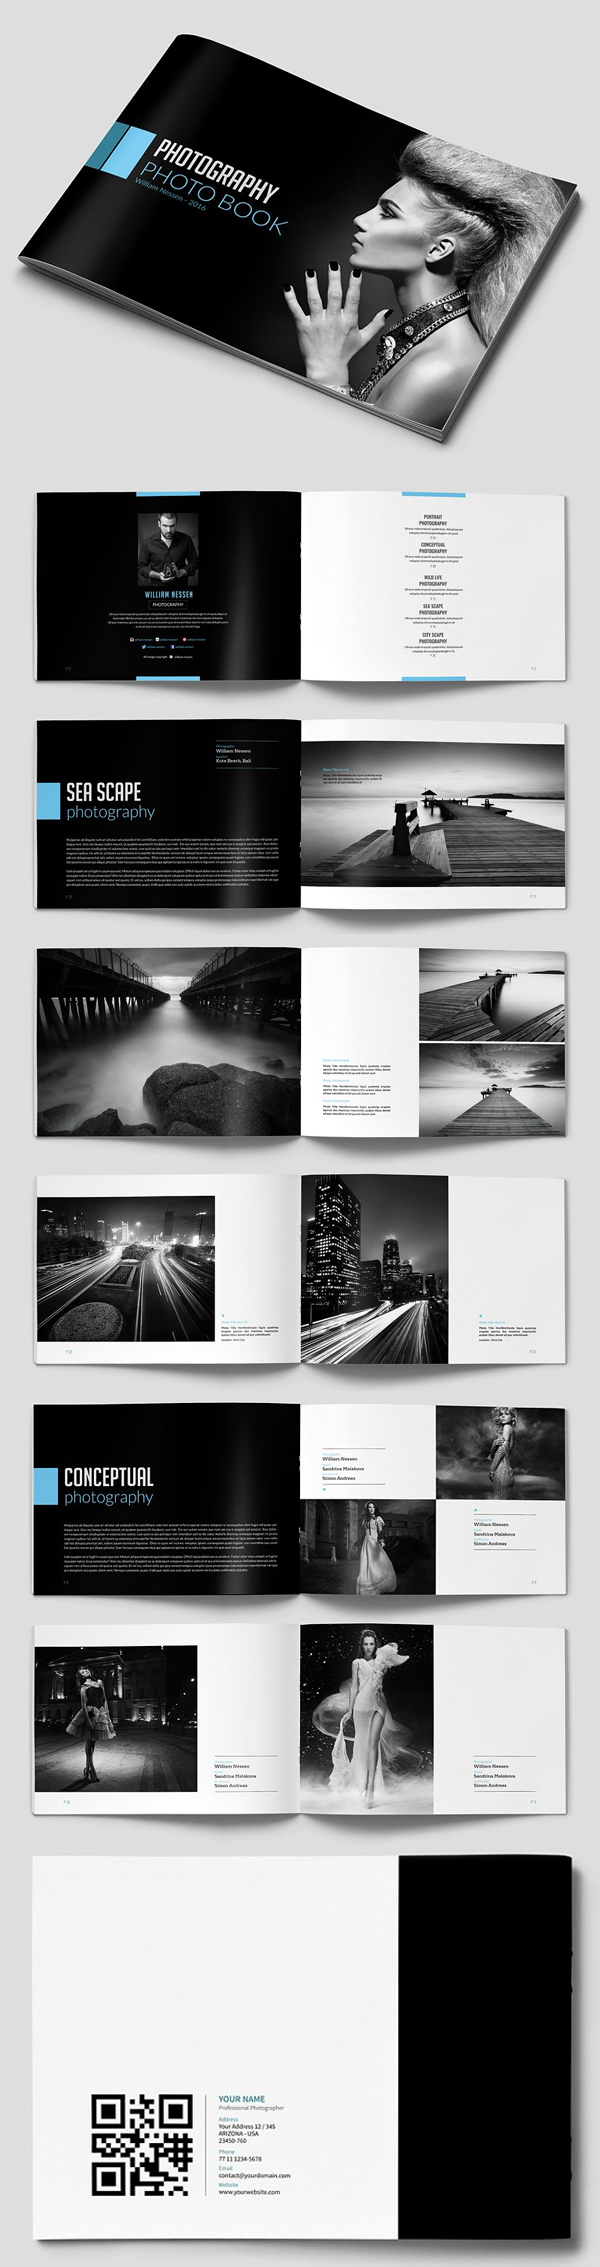 Minimal Photography Brochure Template